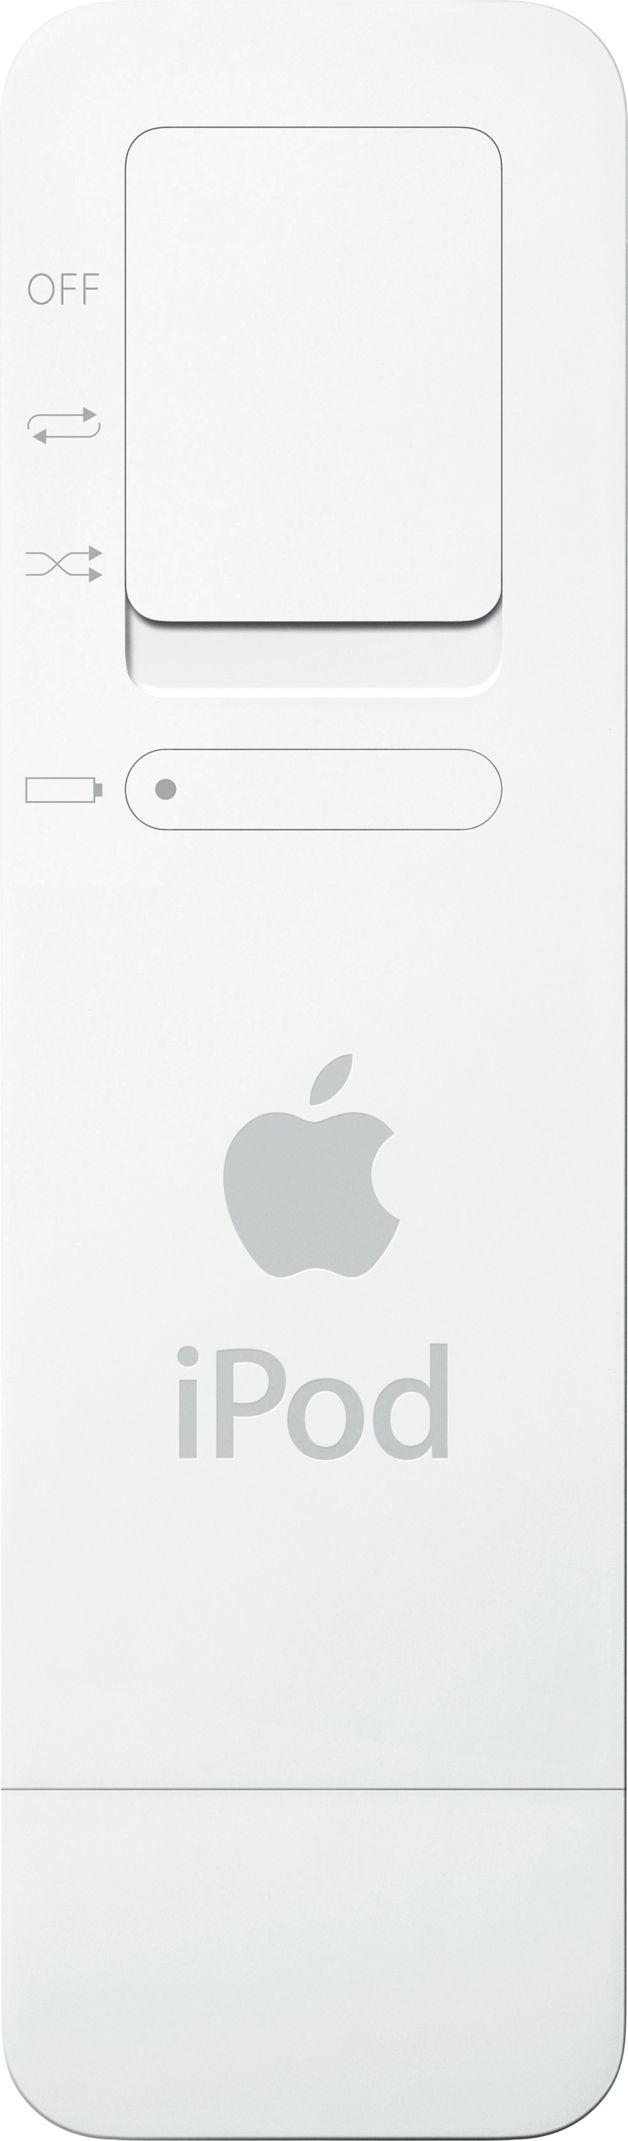 iPod Shuffle Digital Music Player